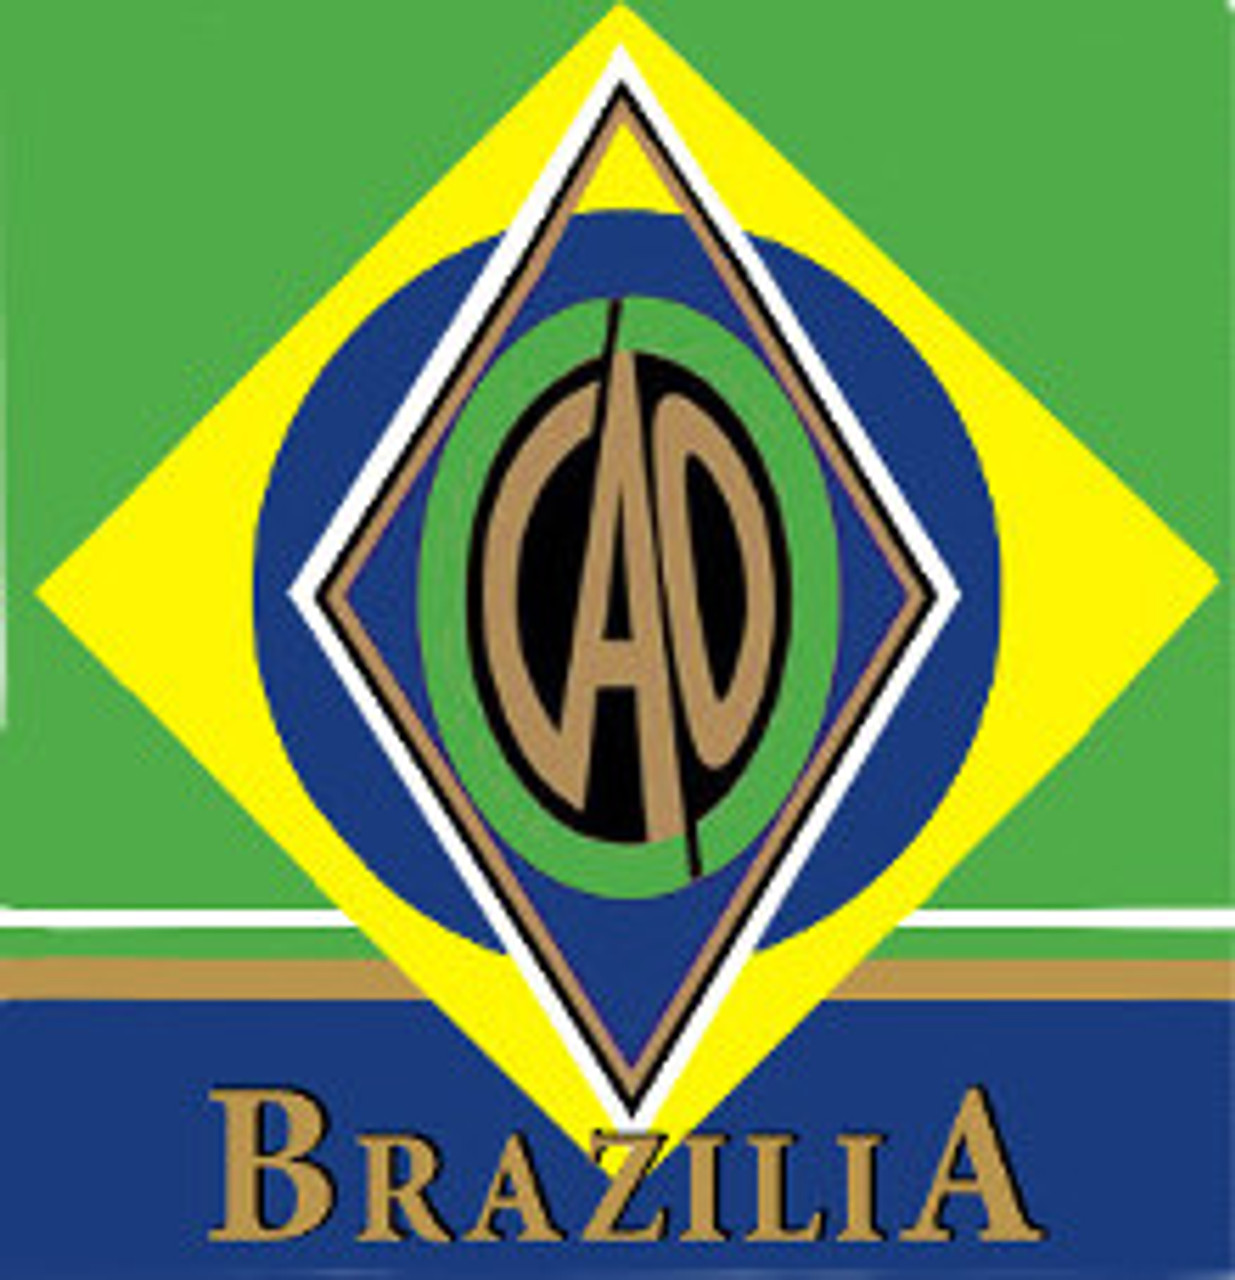 CAO Brazilia Samba Cigars - 6 1/4 x 54 (Box of 20)